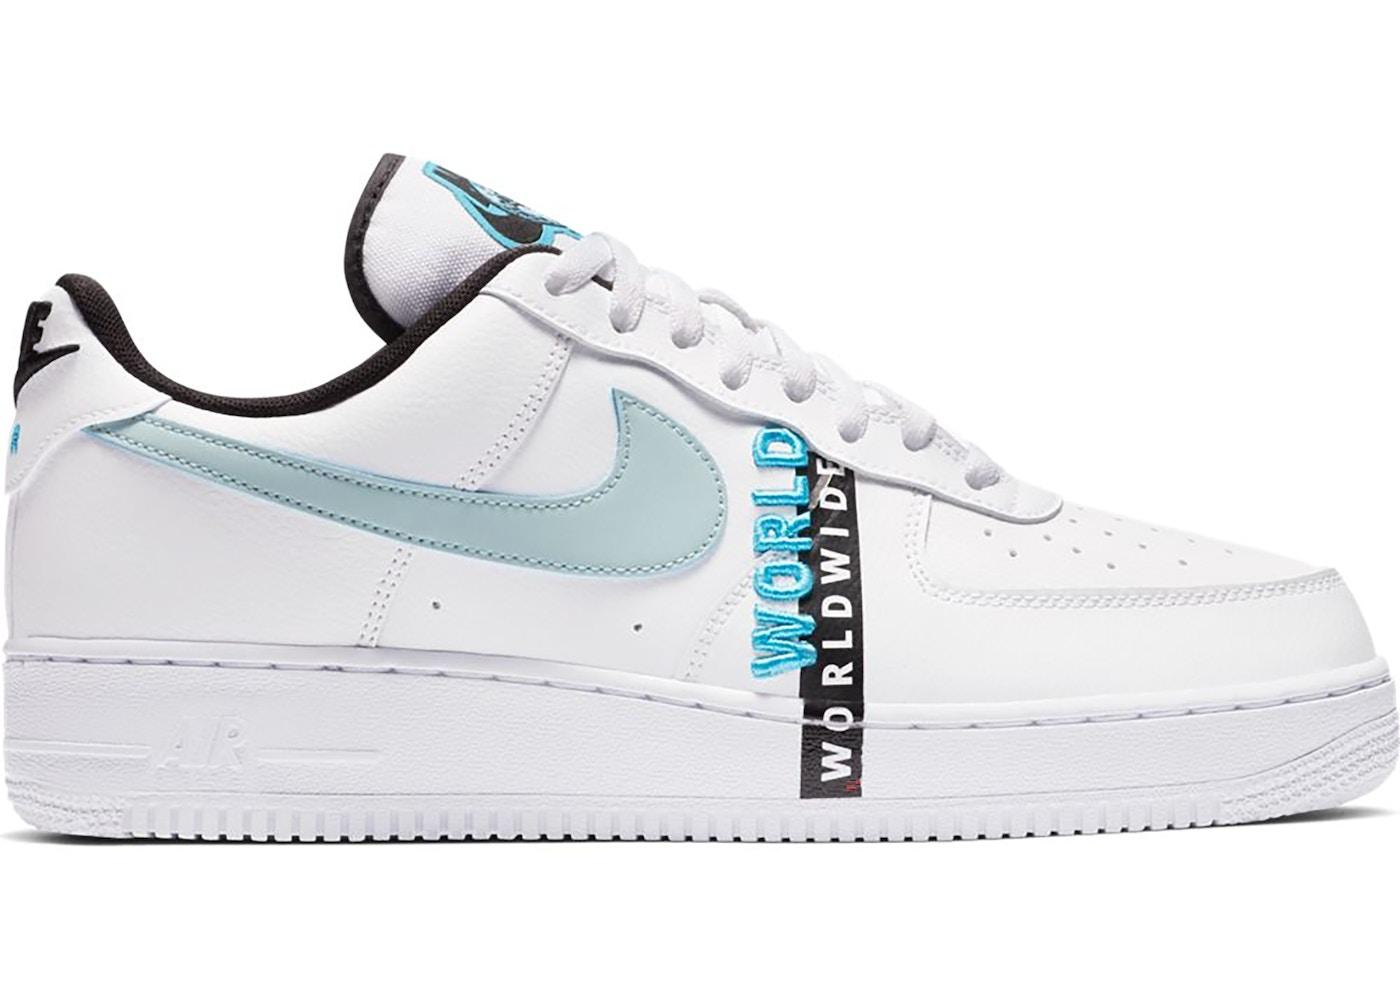 Nike Air Force 1 Low Worldwide White Blue Fury Ck6924 100